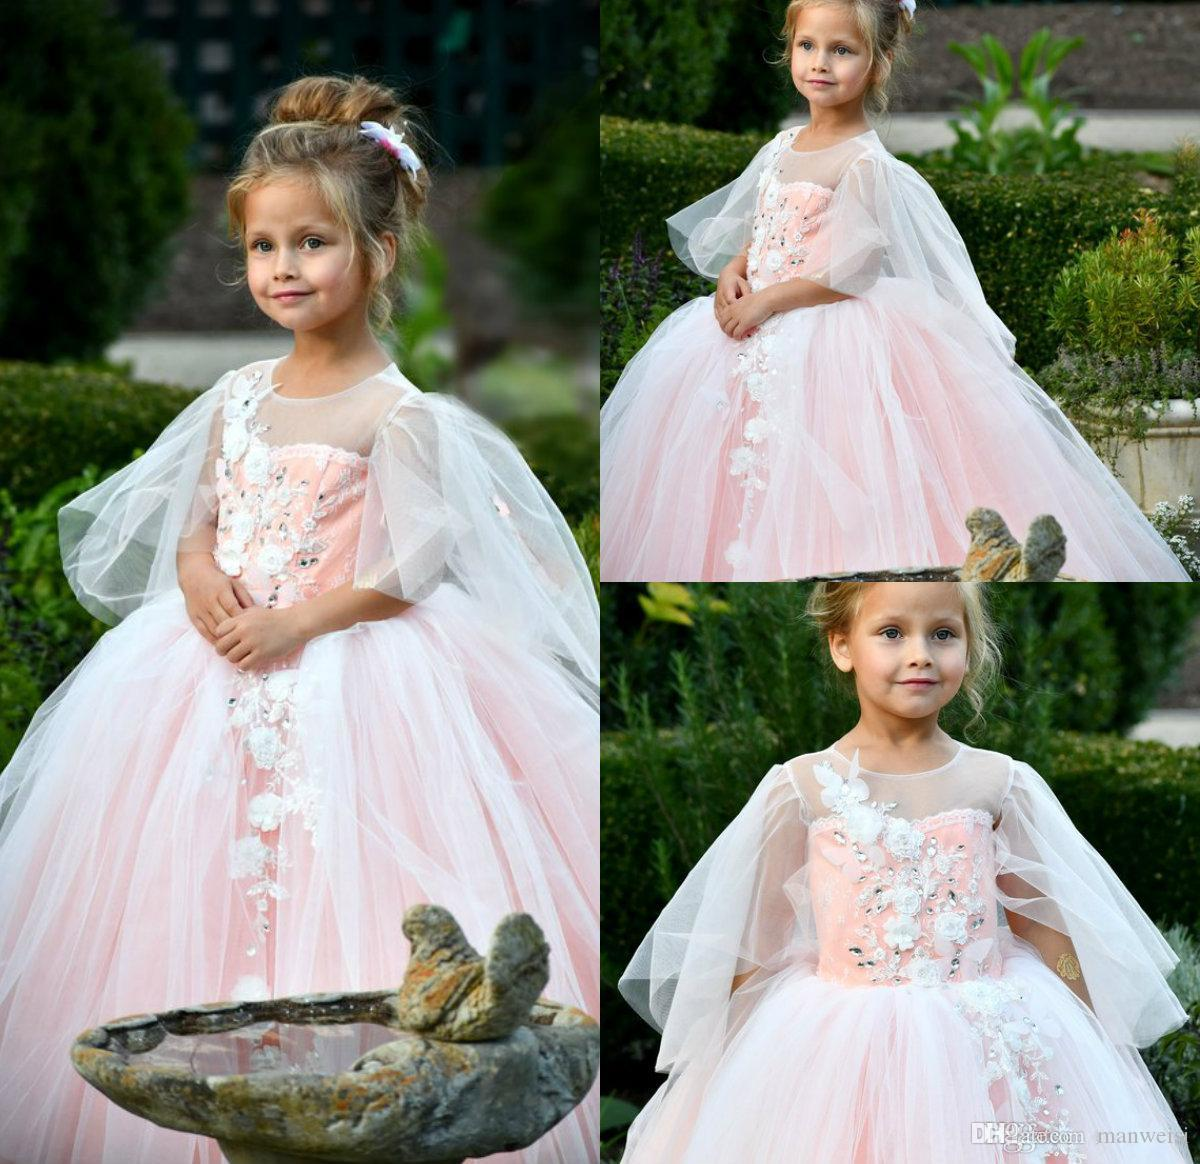 bacef3539c67 Princess 2019 Pink Flower Girl Dresses Daughter Toddler Pretty Kids ...